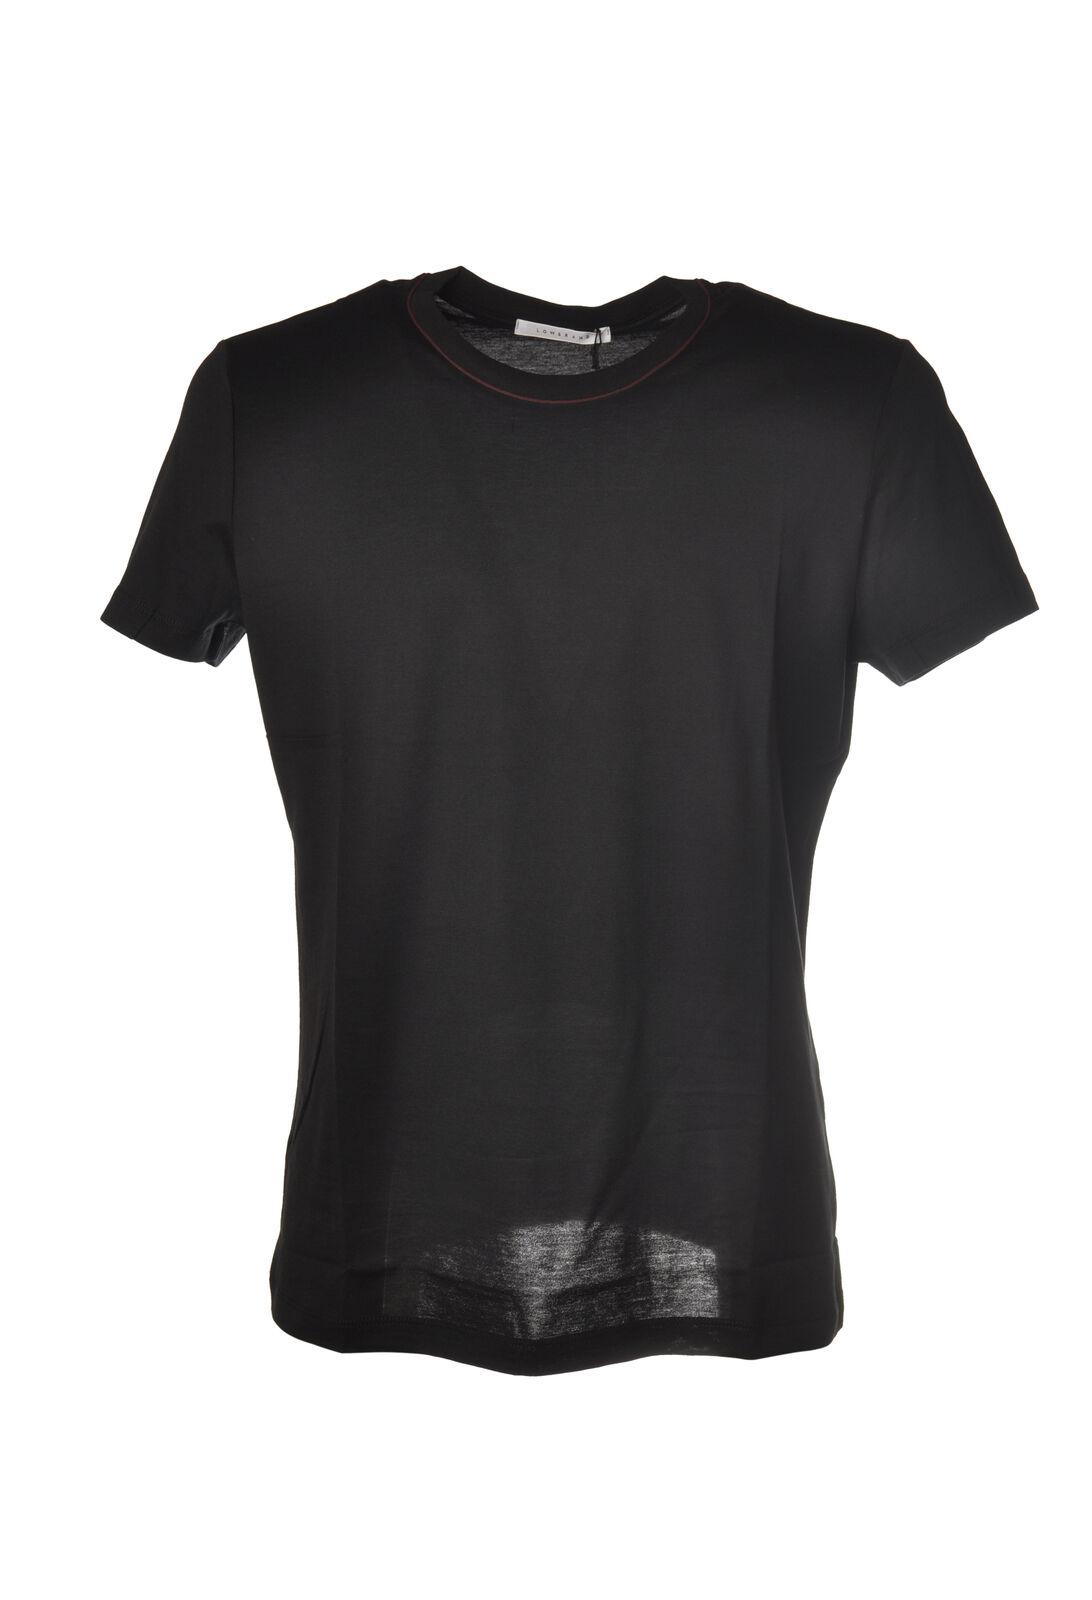 Low Brand - Topwear-T-shirts - Uomo - Nero - 5661409L184720